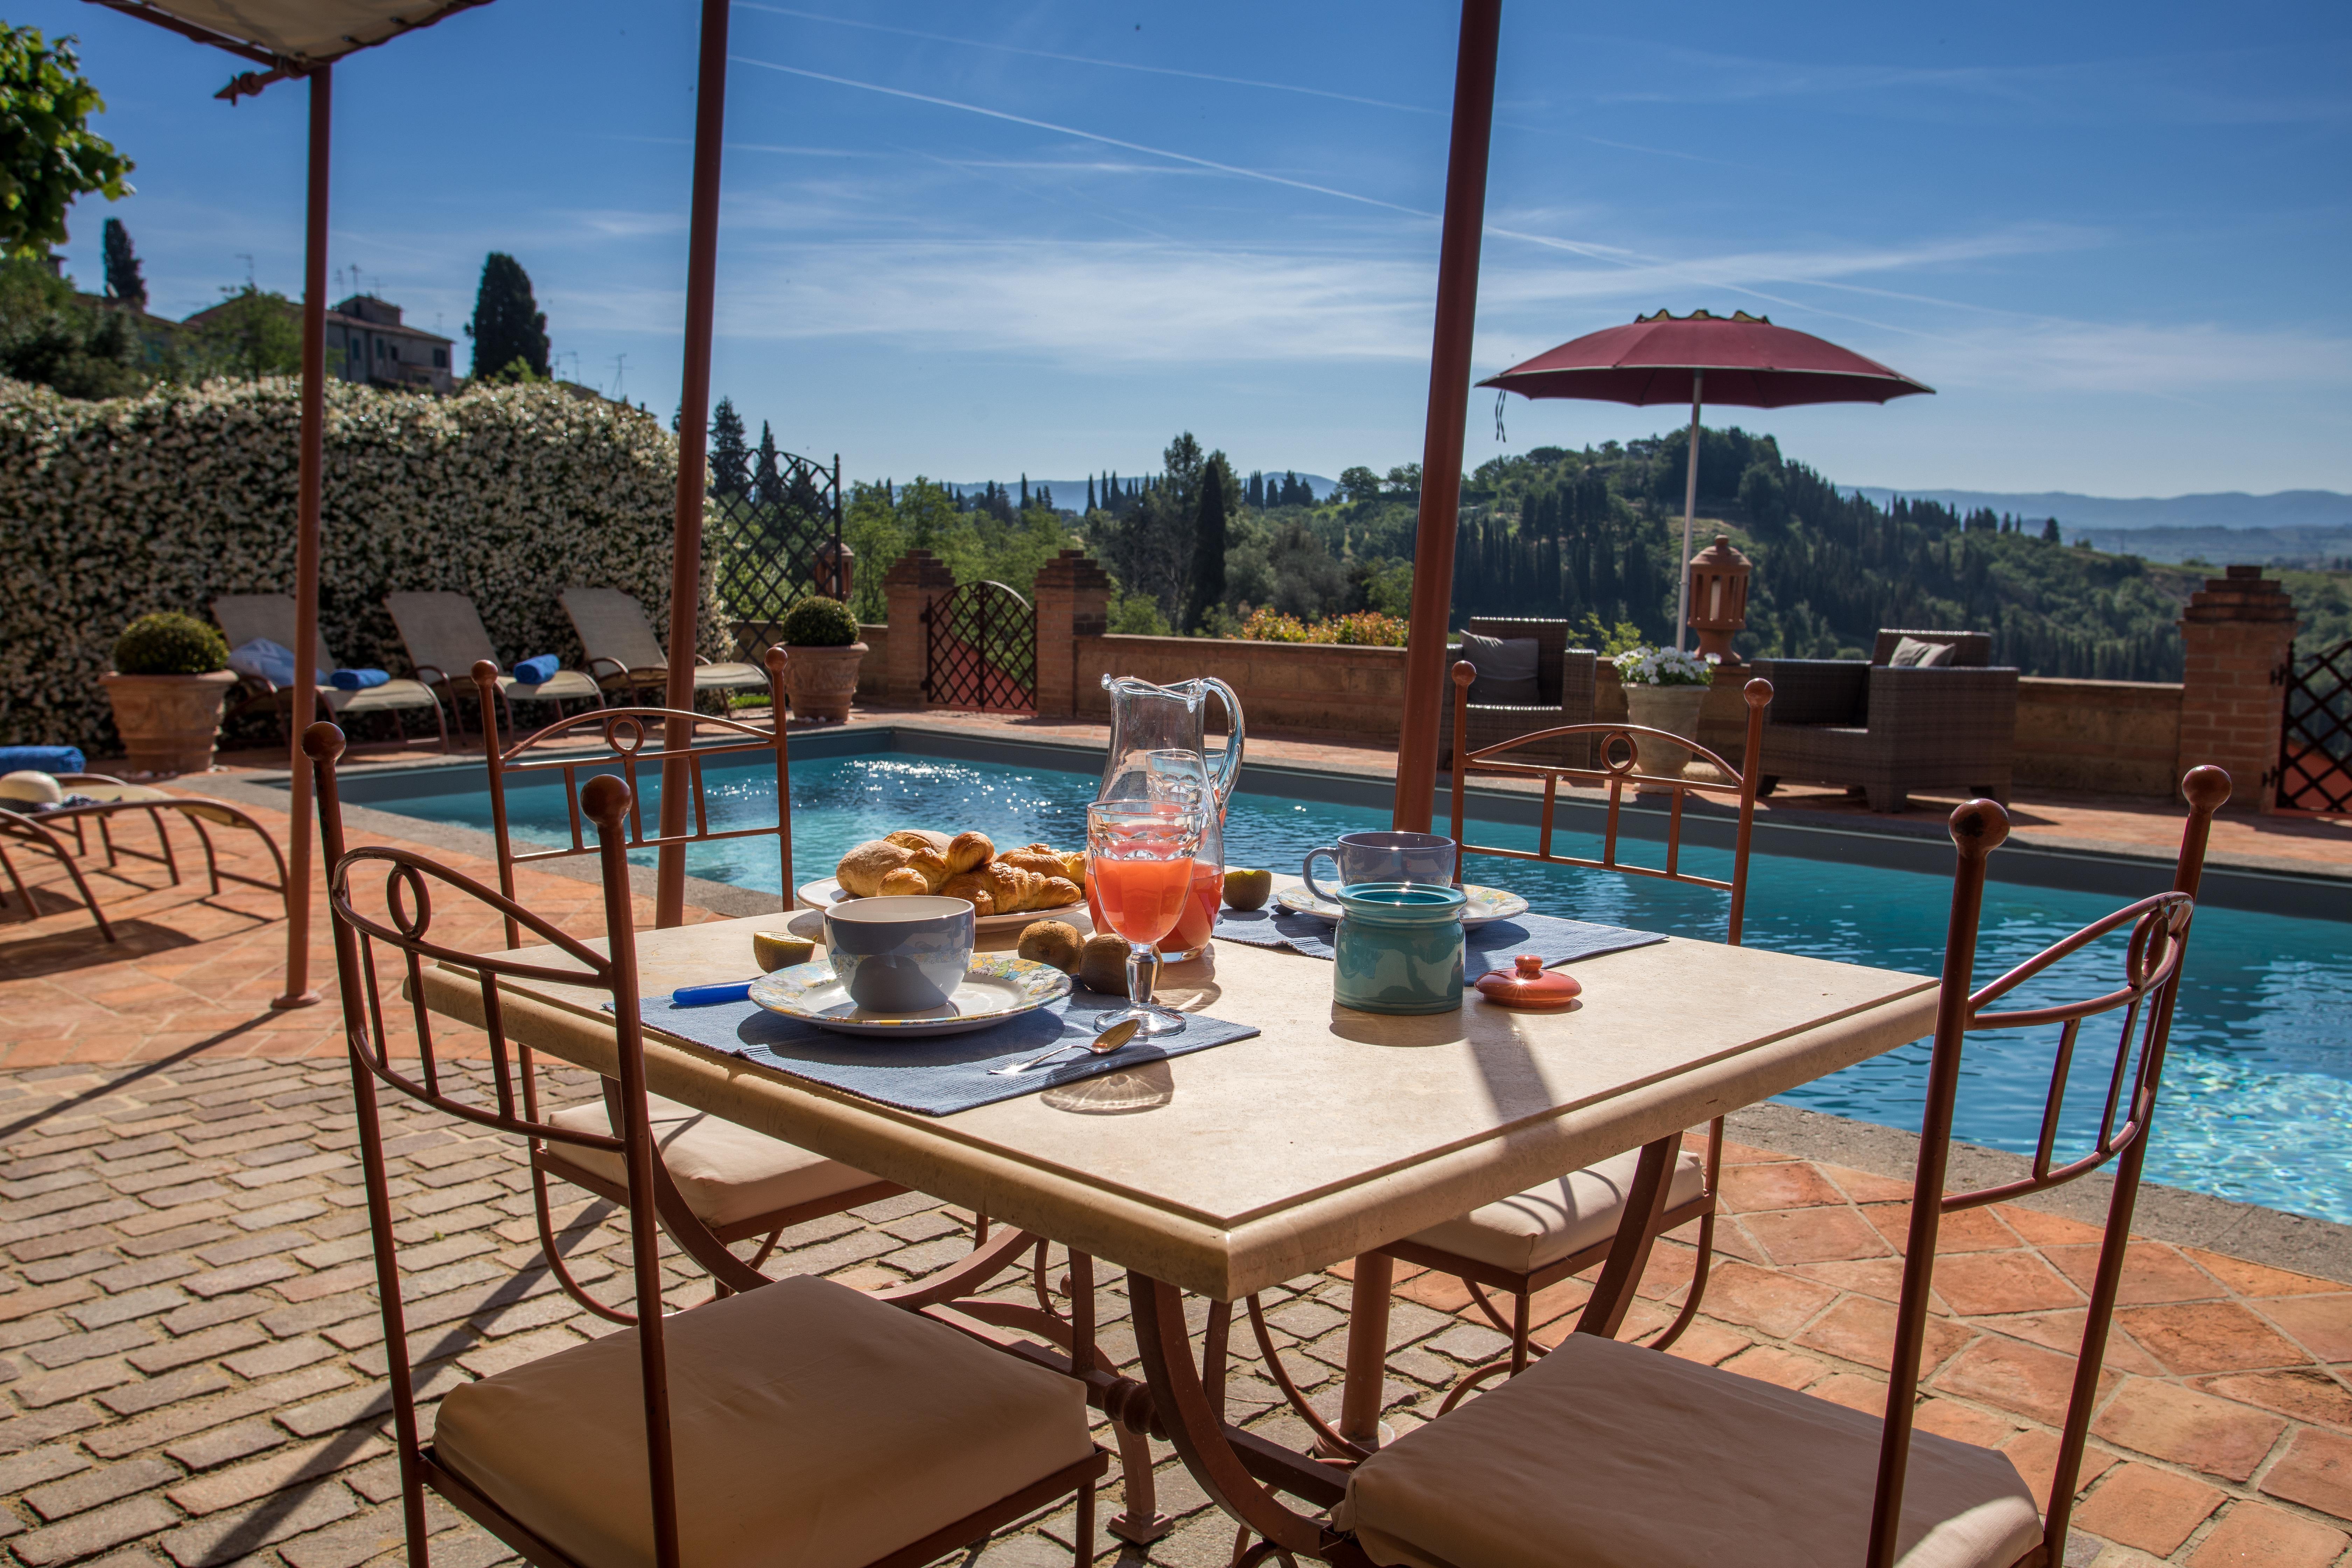 Location vacances toscane villa de luxe avec piscine for Location villa toscane piscine